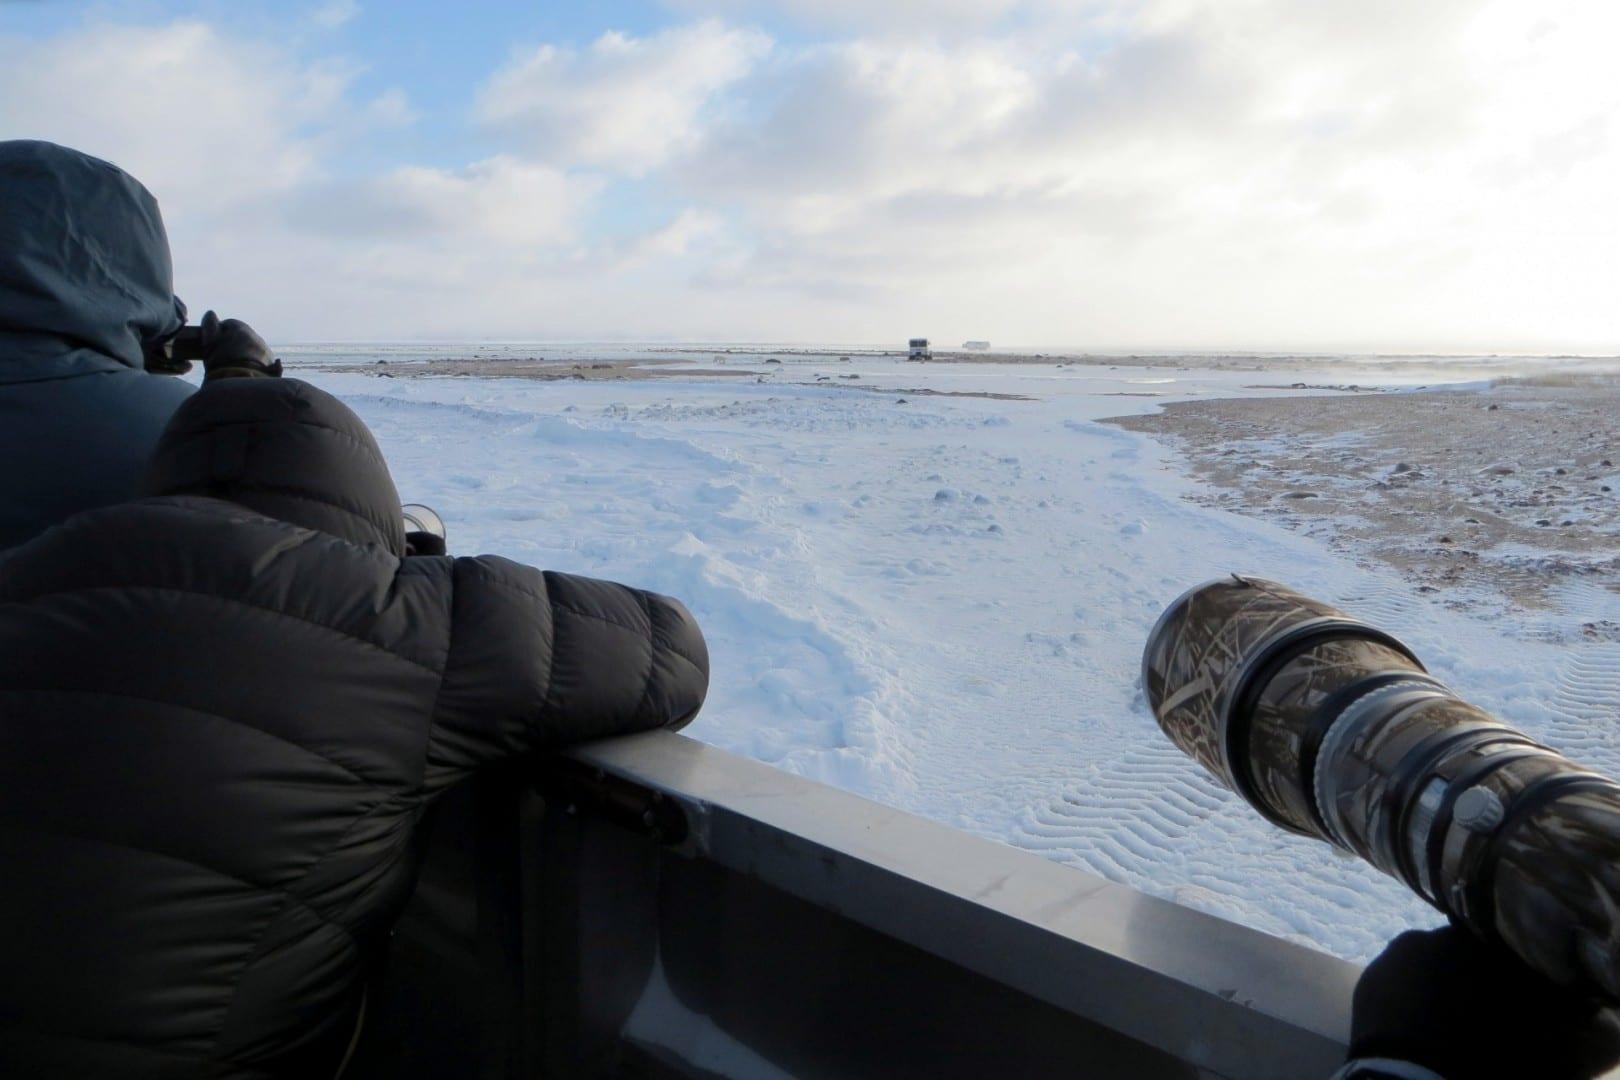 Preparen sus cámaras, fotografía de osos polares desde la parte trasera de un Tundra Buggy Churchill Canadá